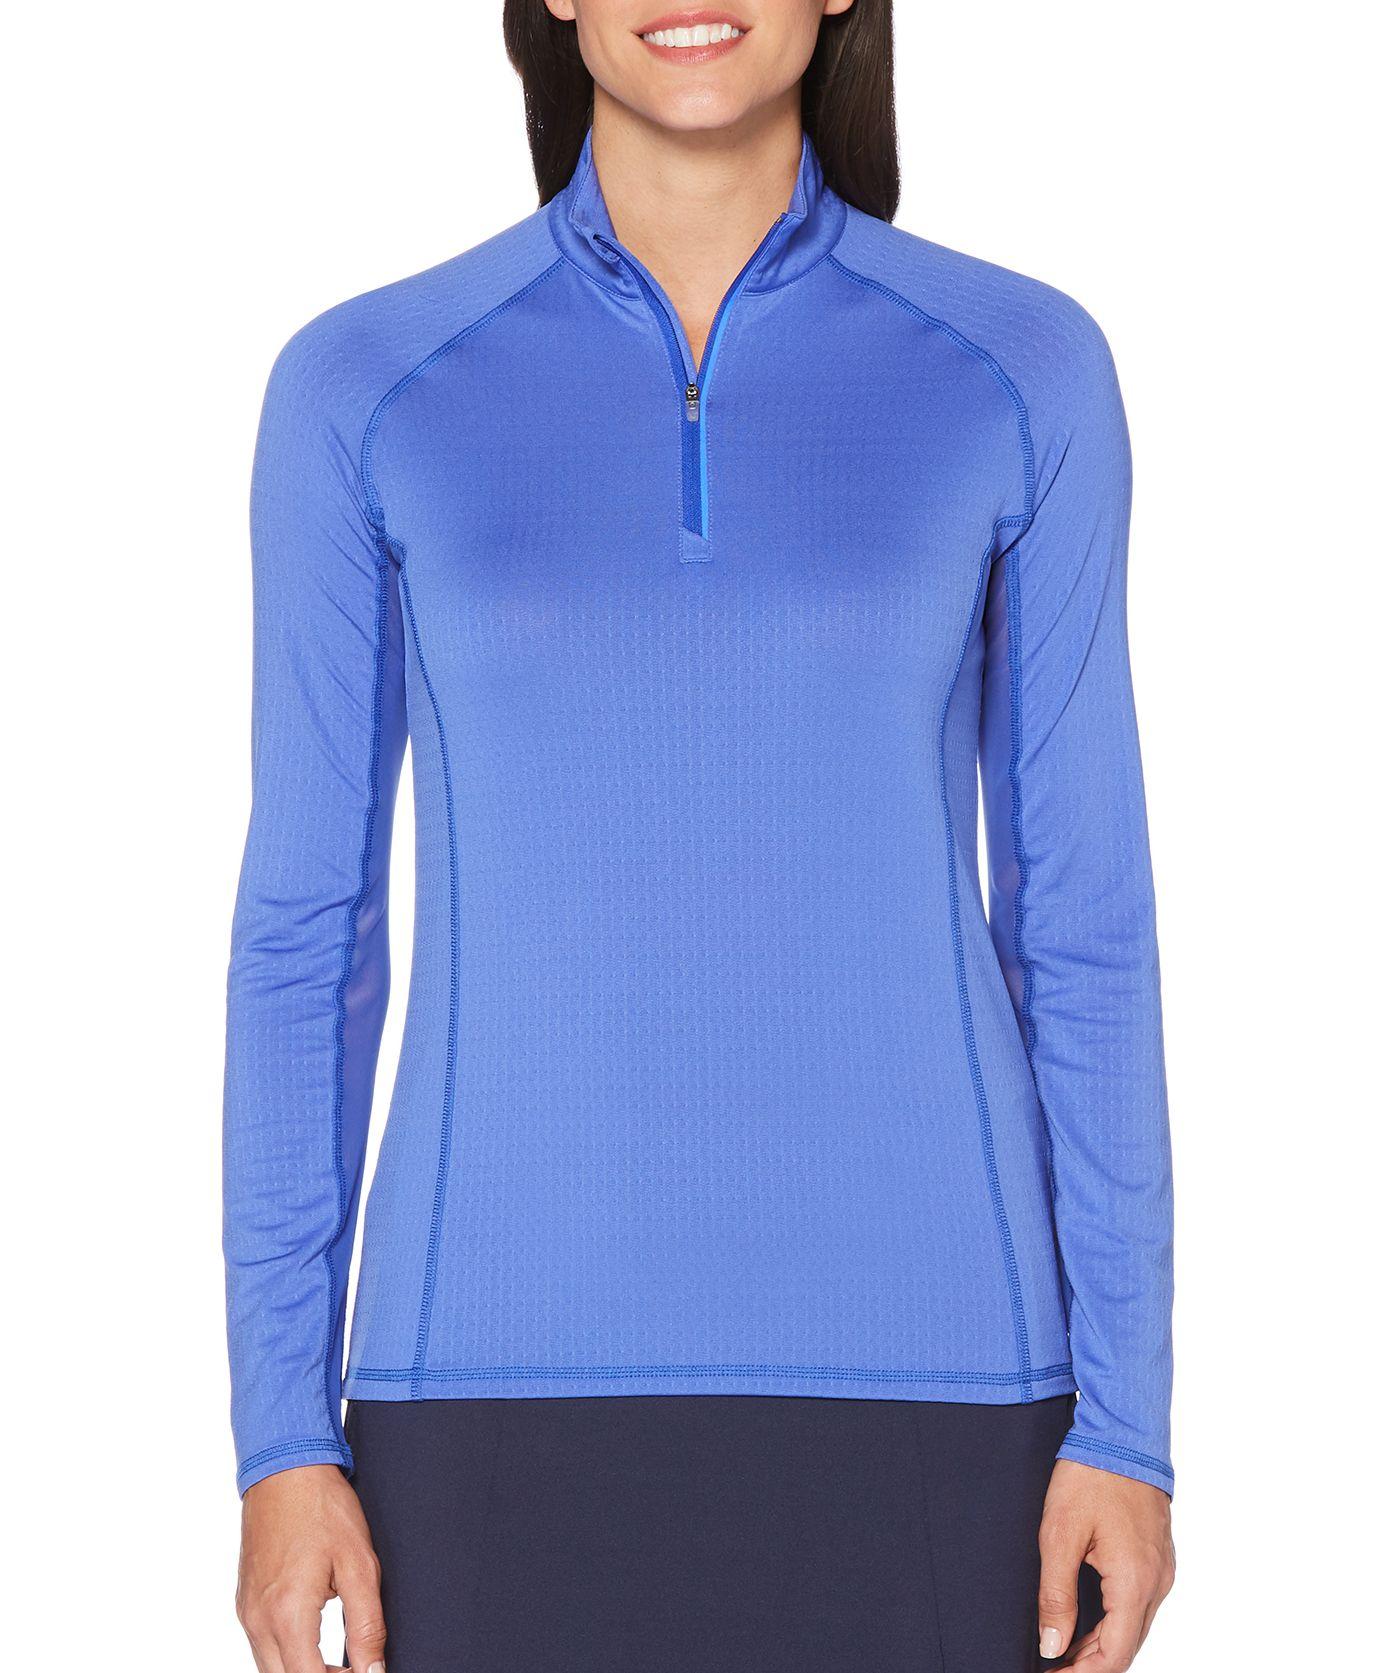 Callaway Women's Cooling Long Sleeve Mock Golf Polo